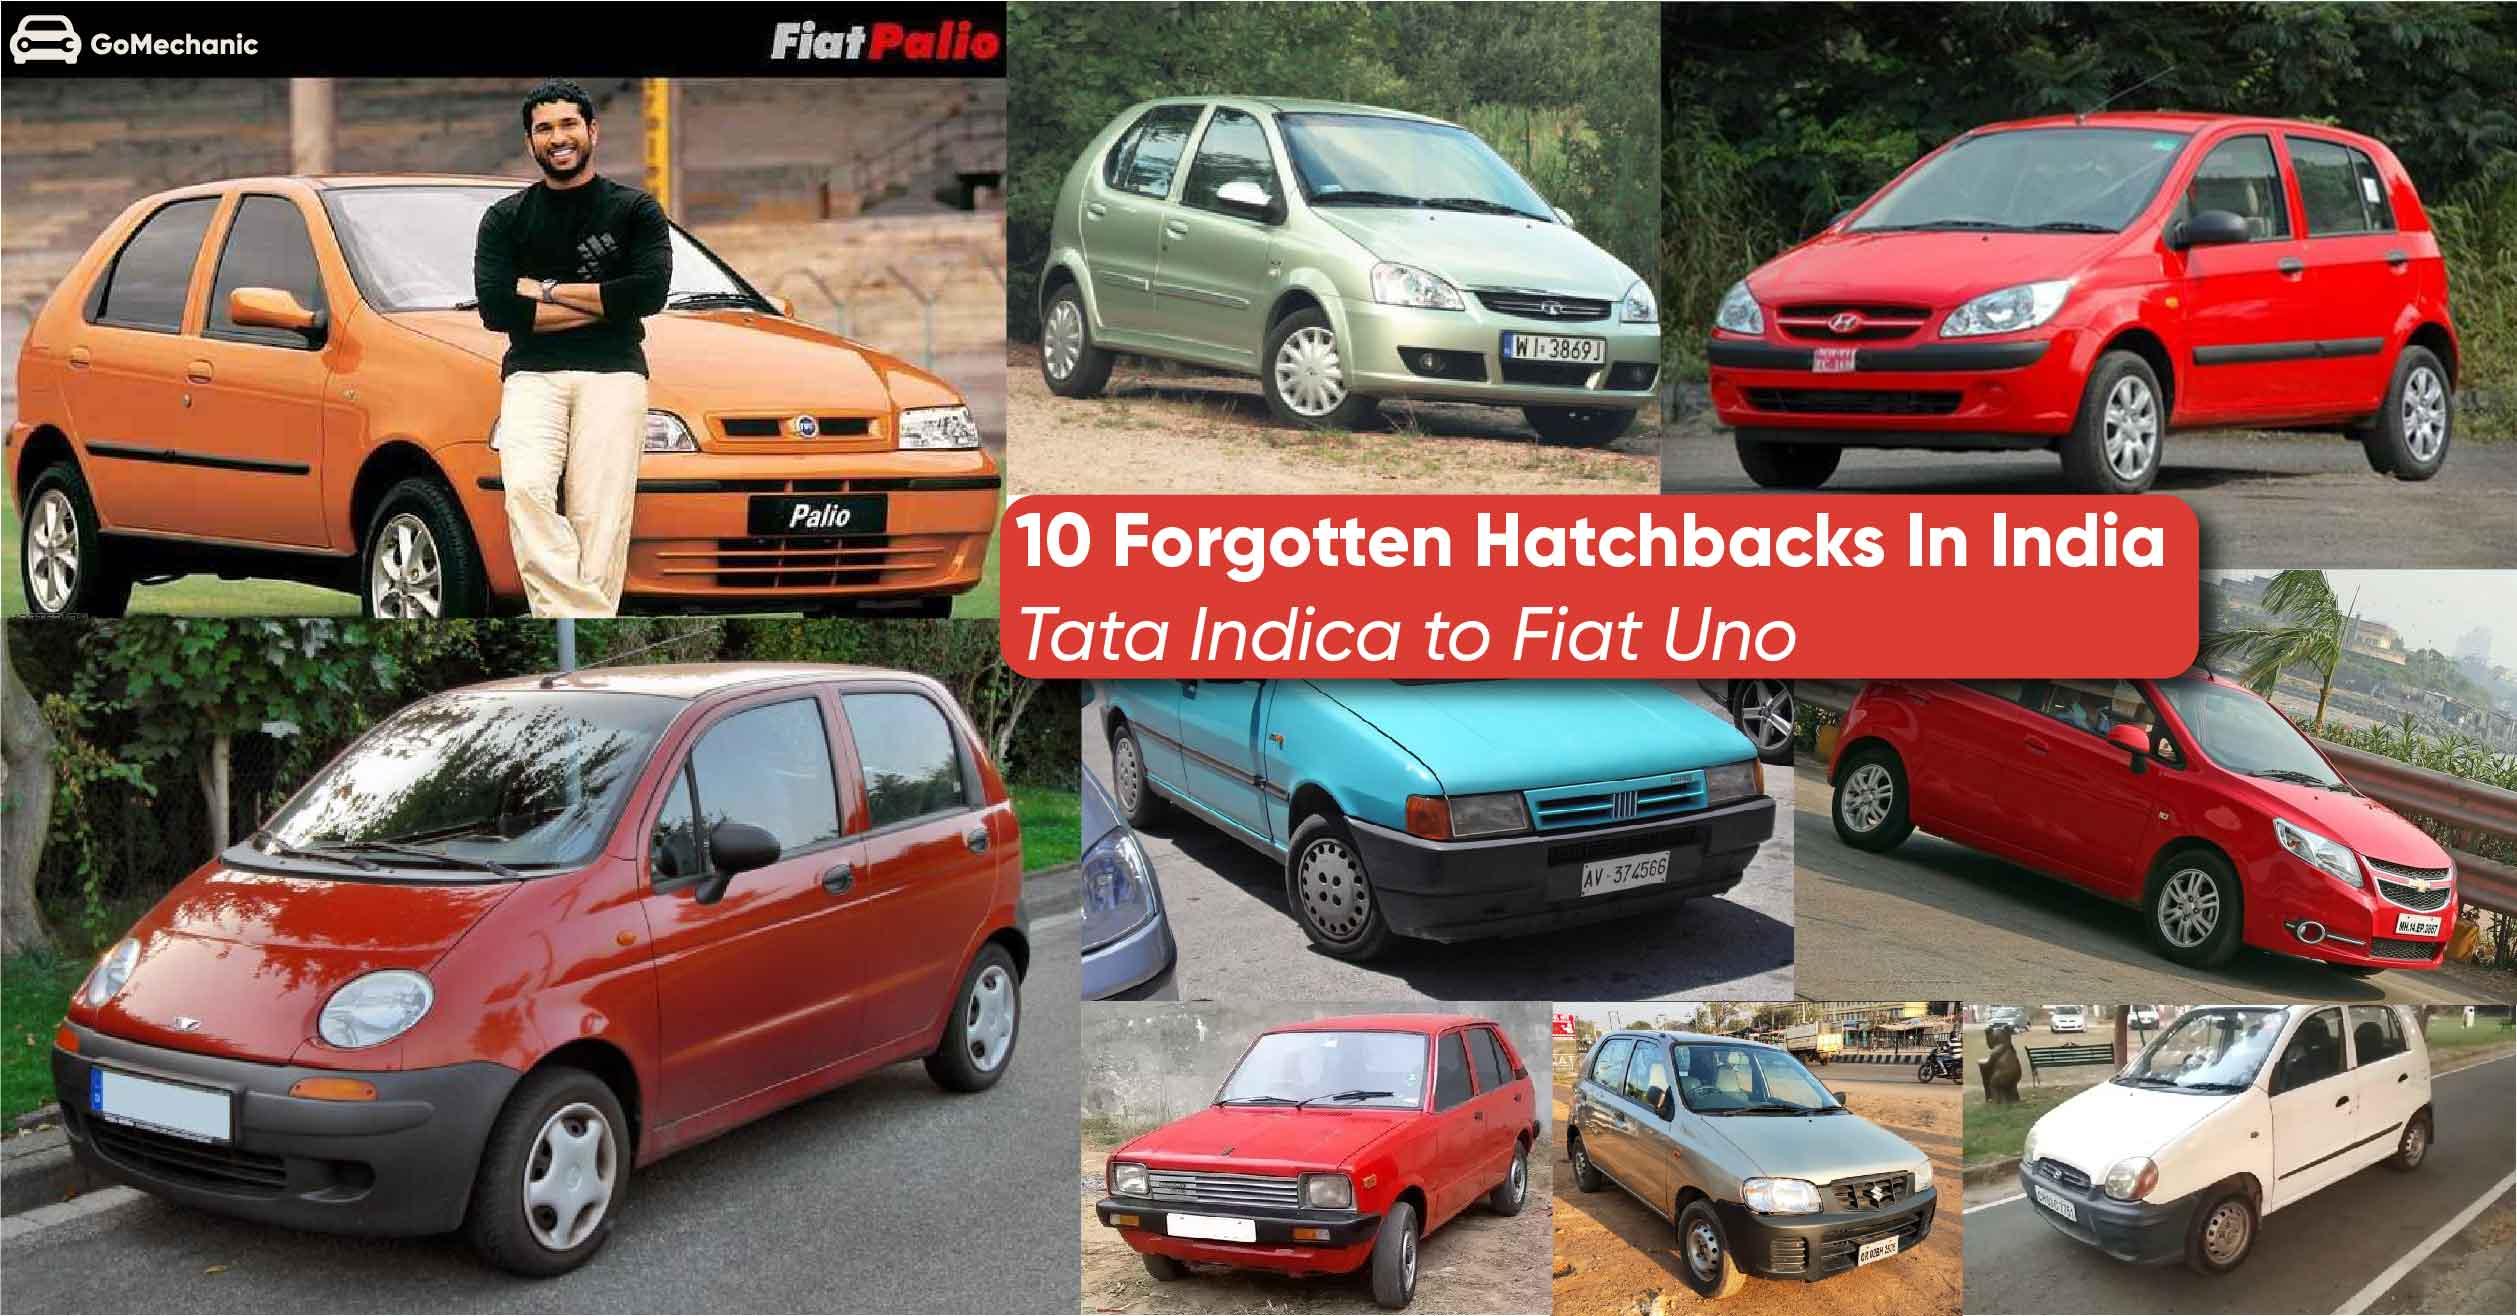 10 Forgotten Hatchbacks In India Tata Indica To Fiat Uno